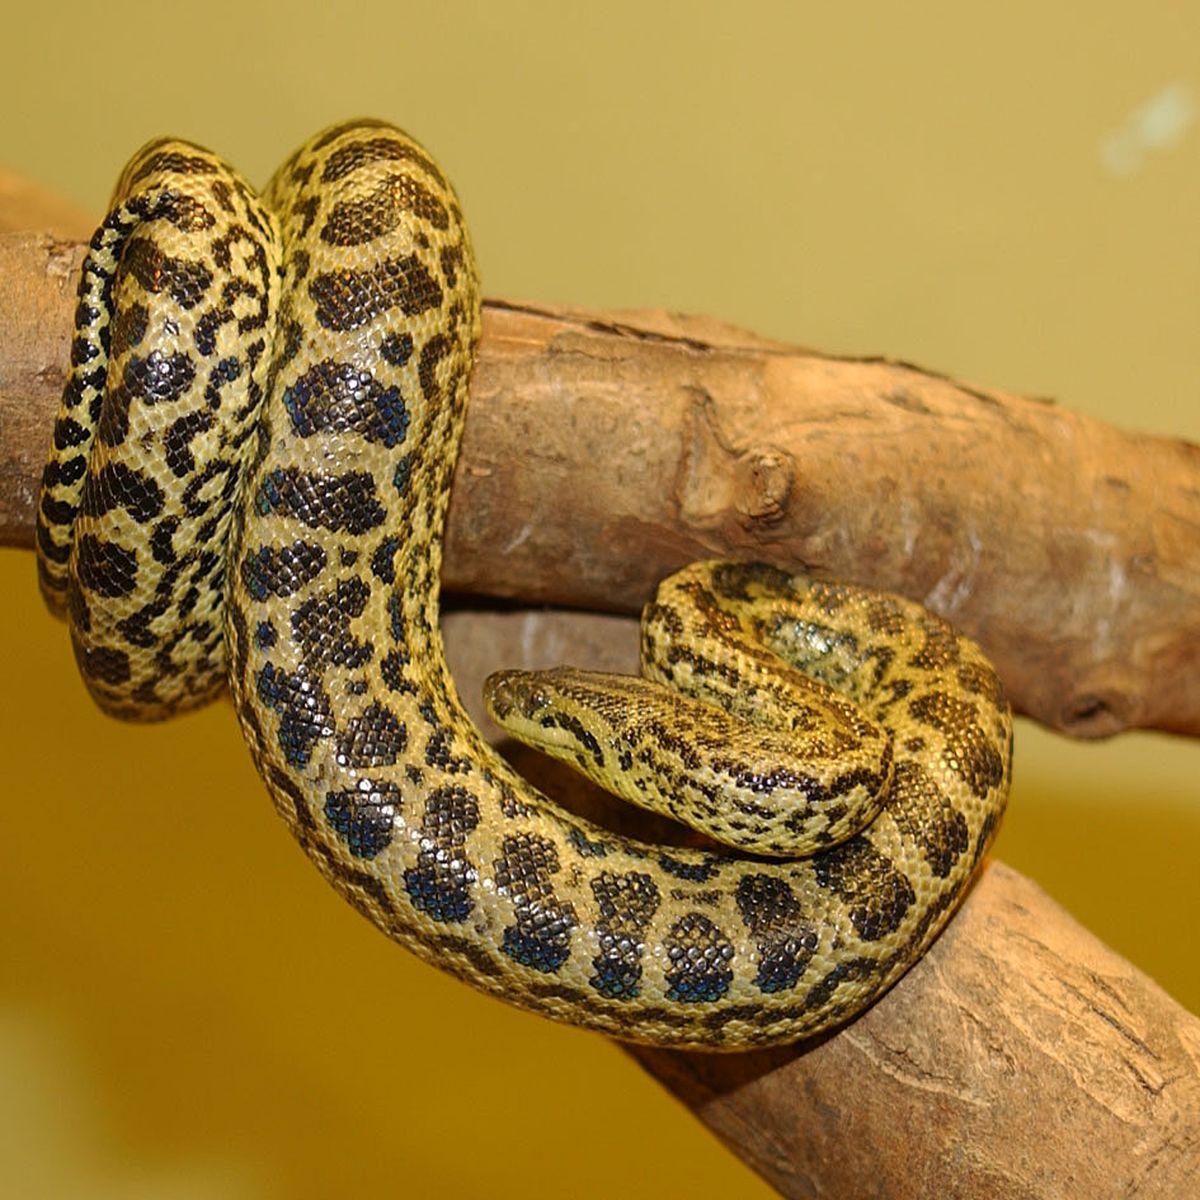 Анаконда, или гигантская анаконда, или обыкновенная анаконда, или зелёная анаконда (лат. Eunectes murinus)